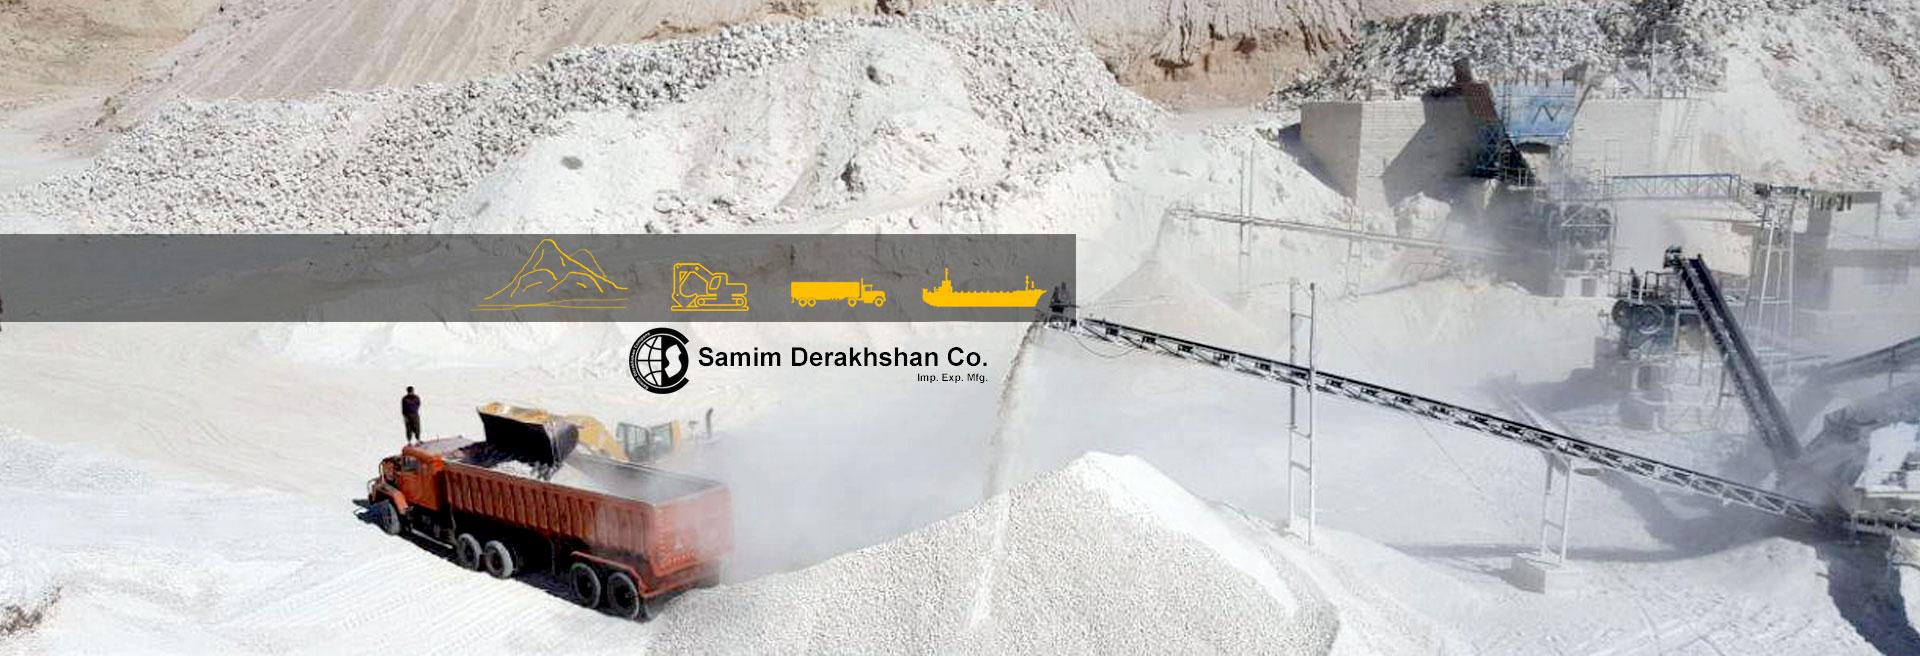 Samim Gypsum Iran Gypsum Supply